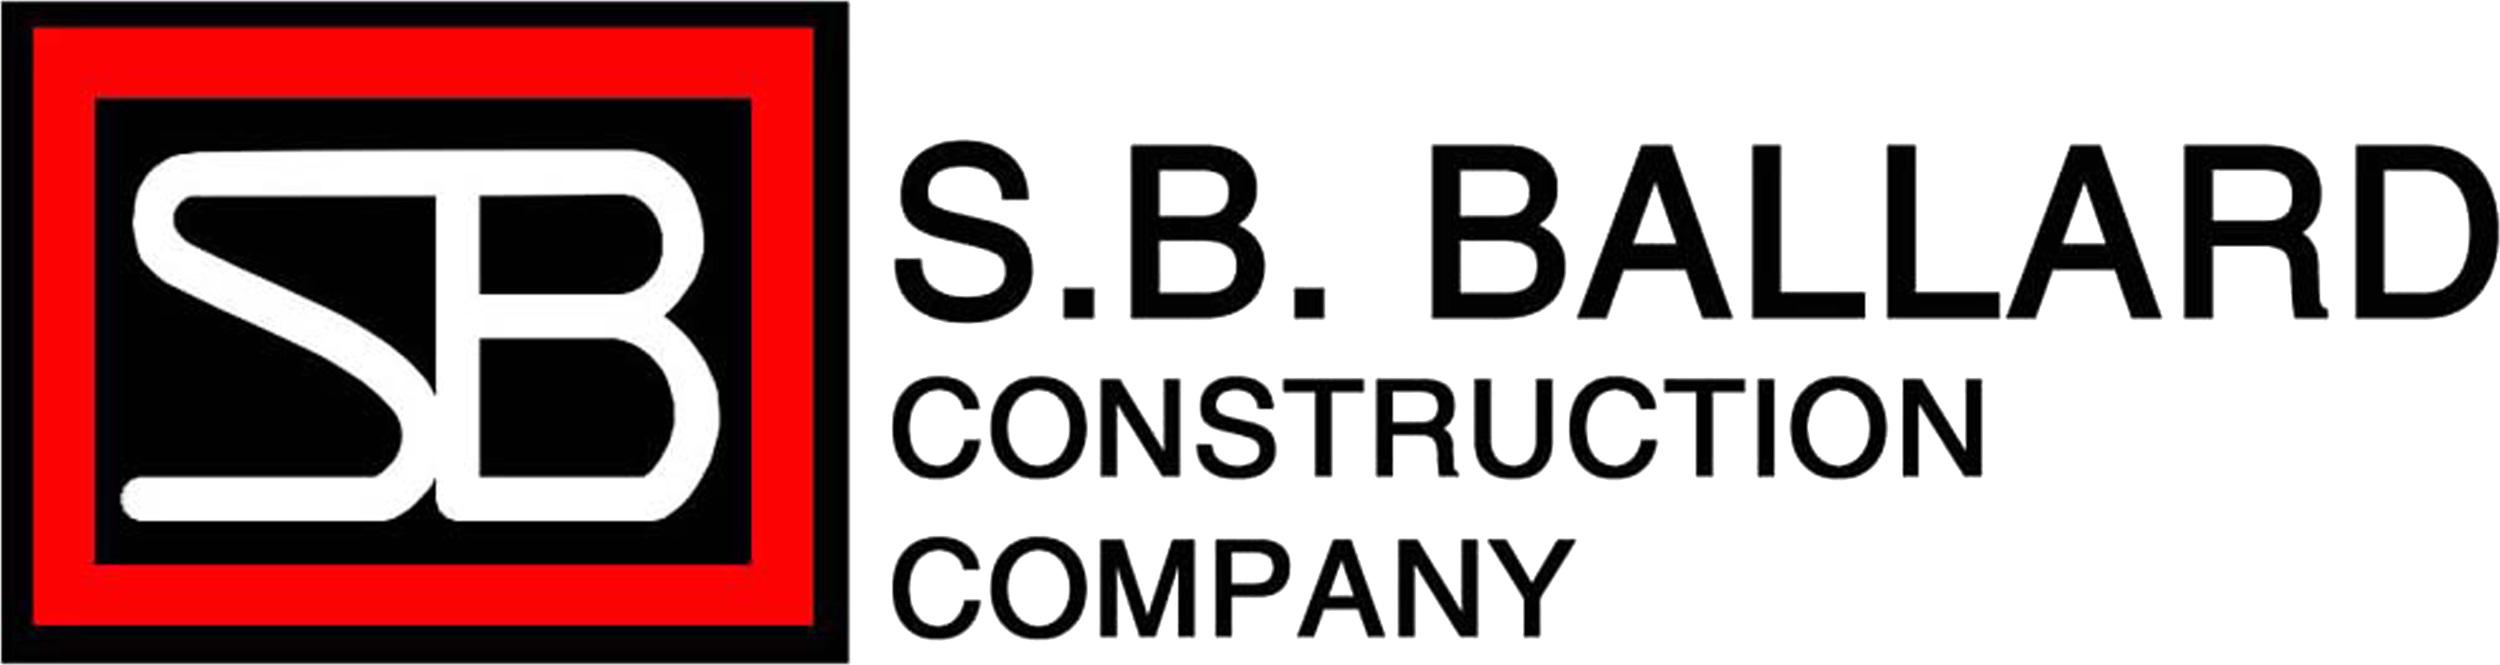 SB Ballard Logo - Large File.jpg